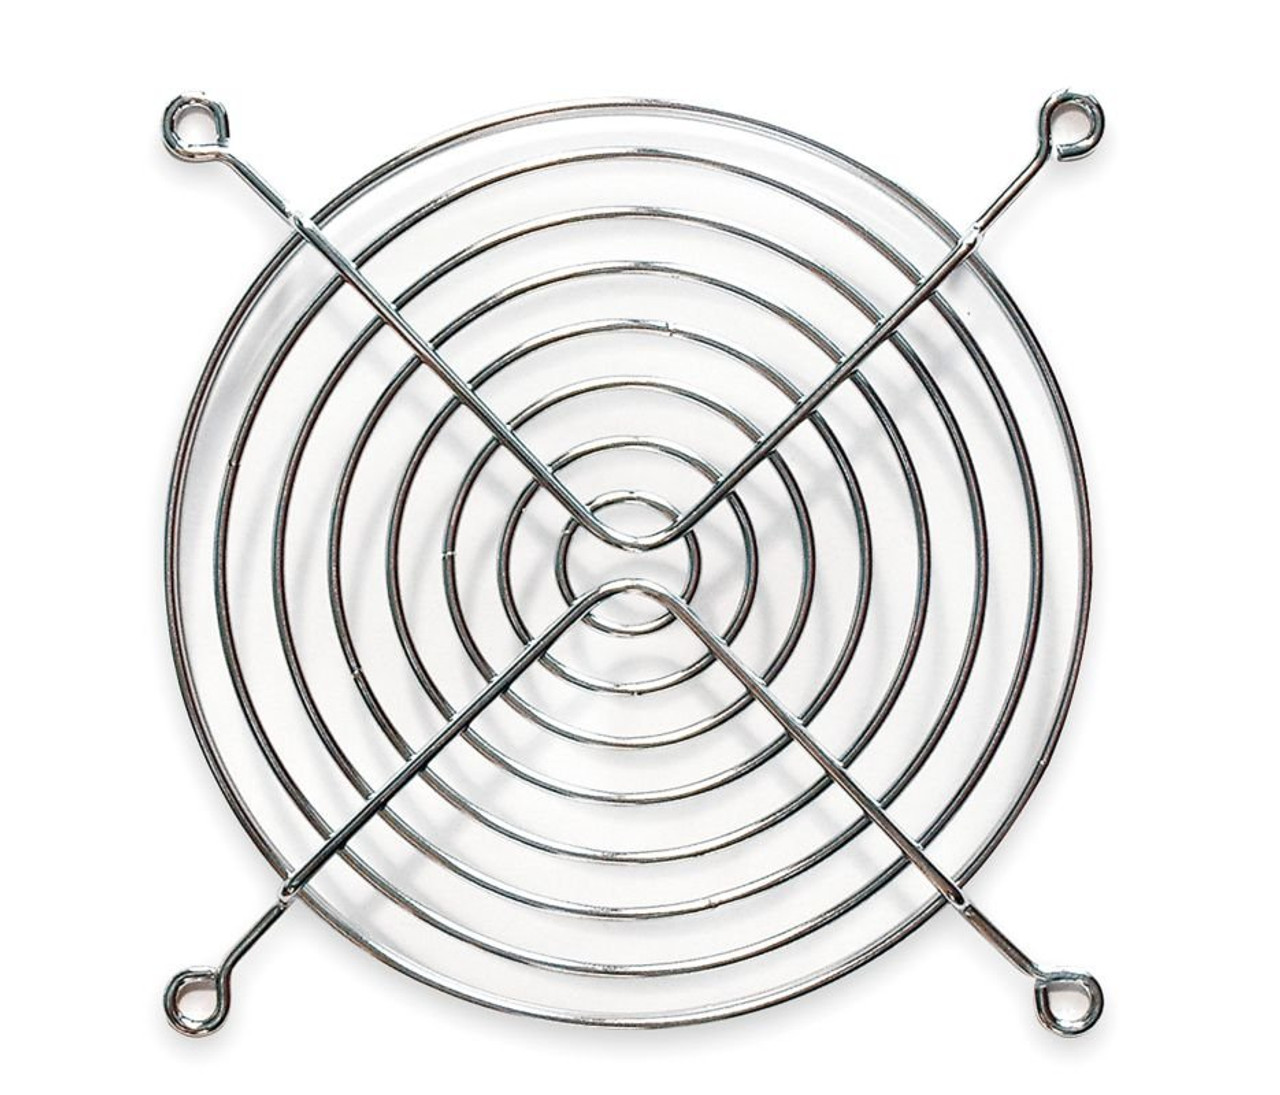 4YD87 Dayton AC Axial Wire Fan Guard